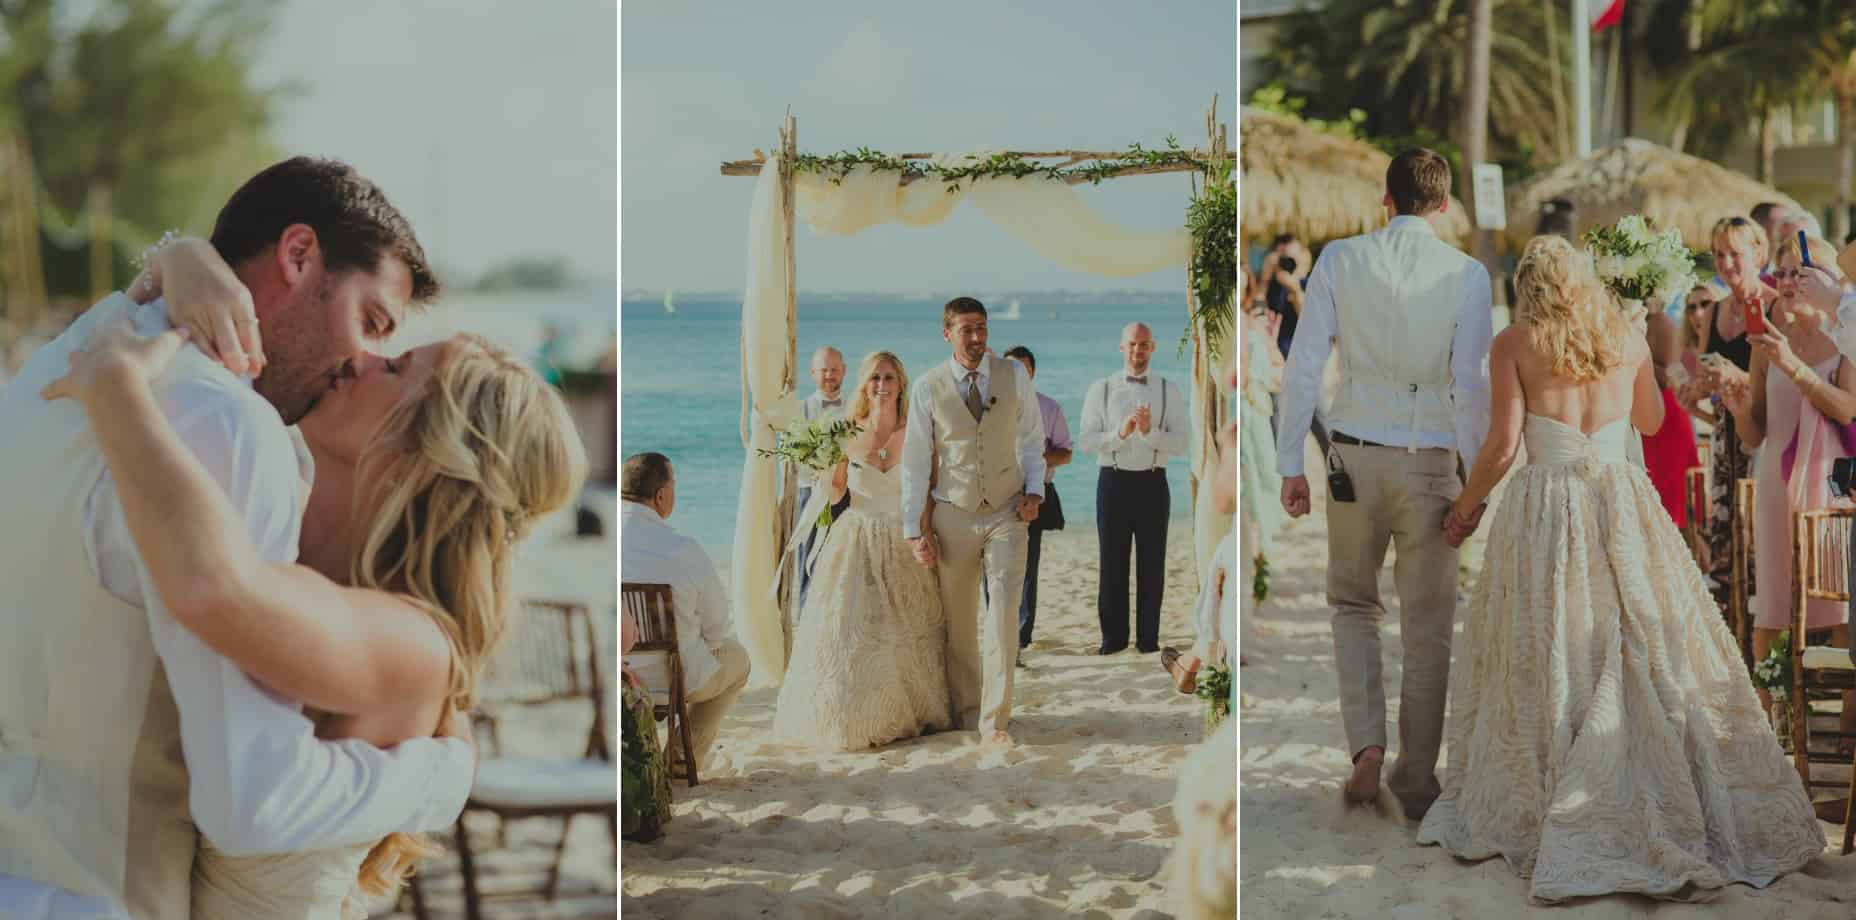 wedding-ceremony-bride-groom-celebrations-ltd-cayman-islands-destination-wedding